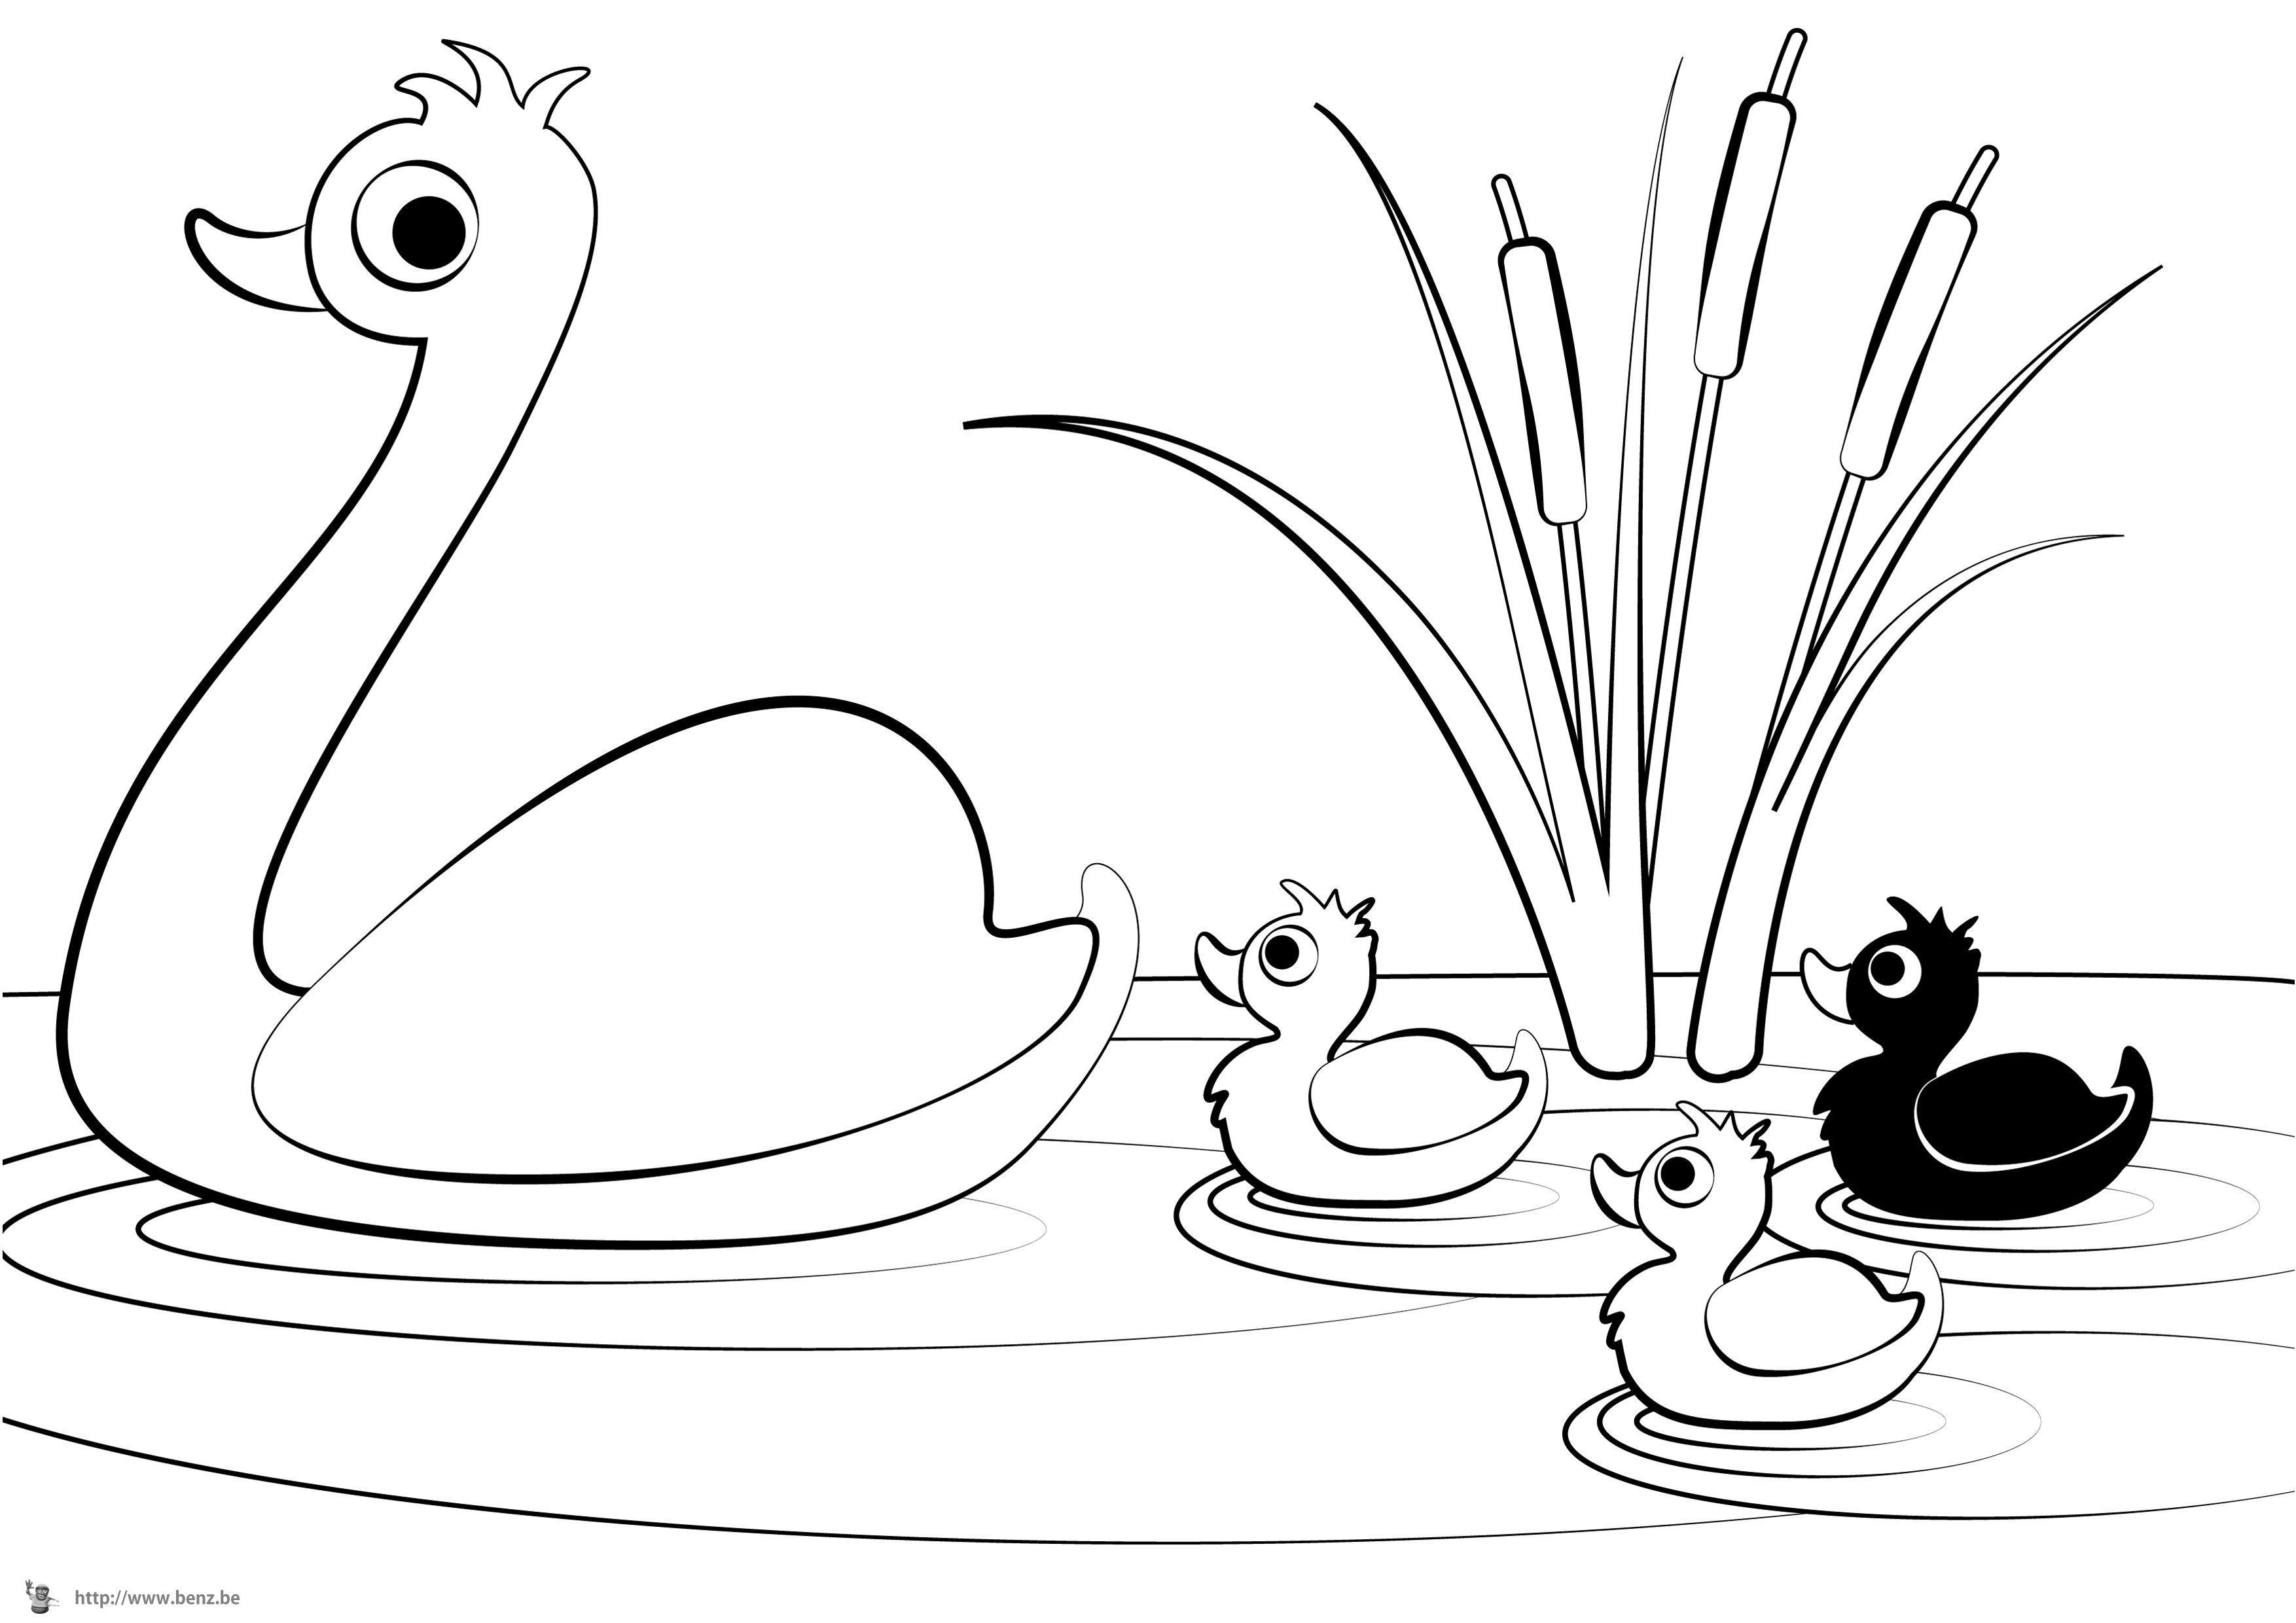 Coloriage de dessins de canards - Image canard a imprimer ...